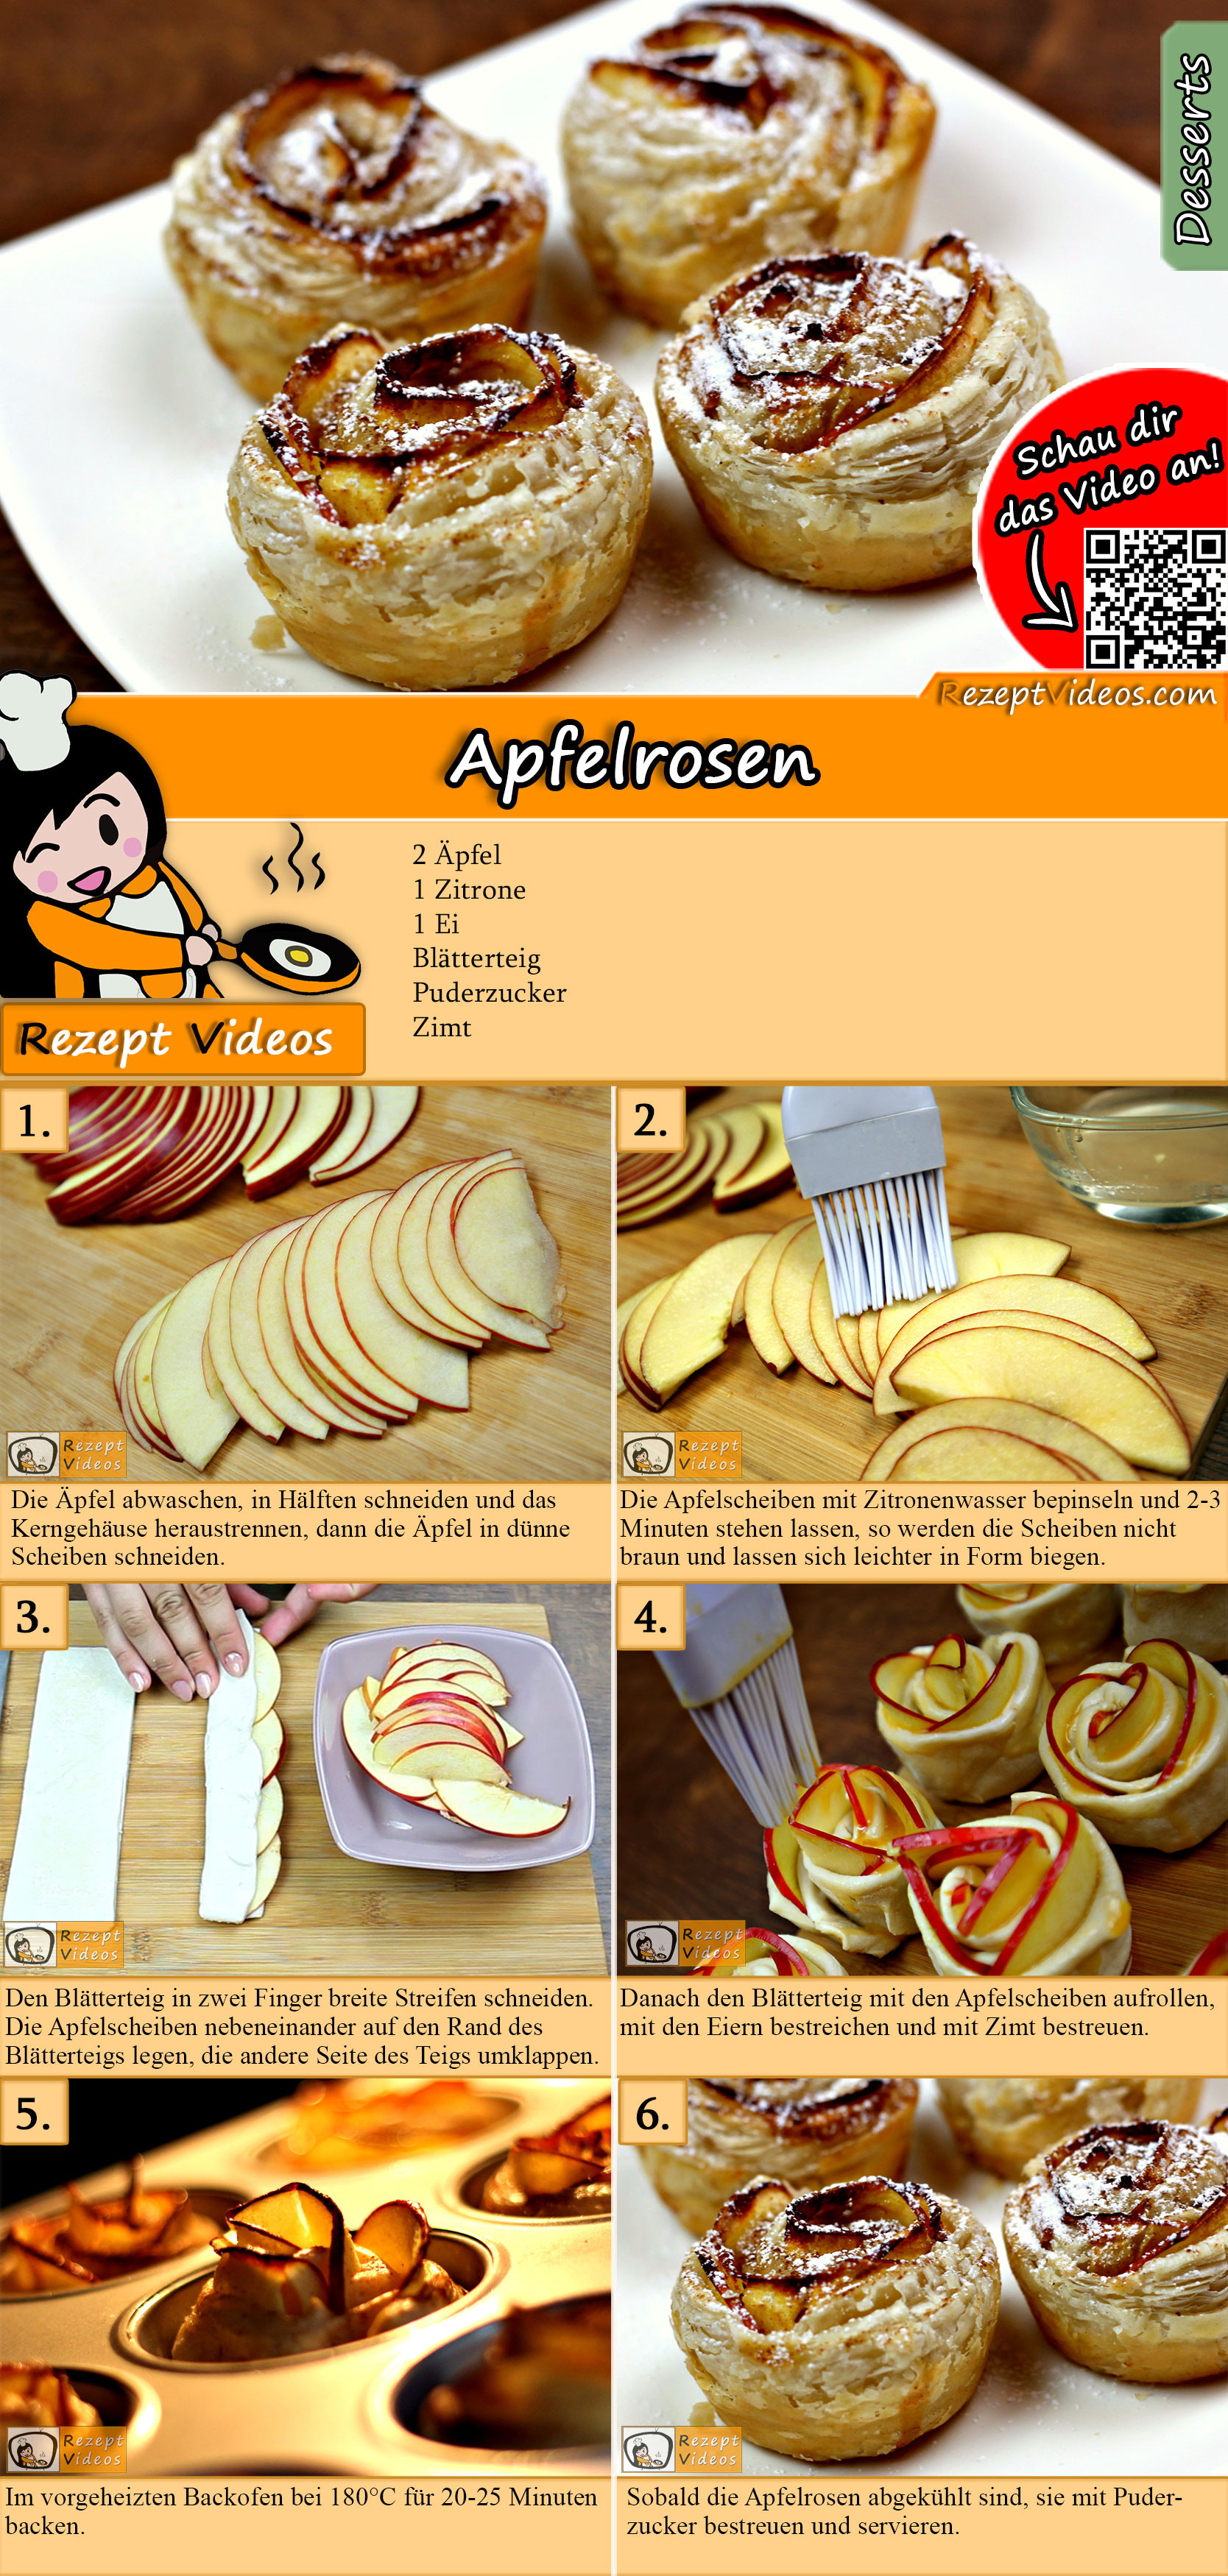 Apfelrosen Rezept mit Video